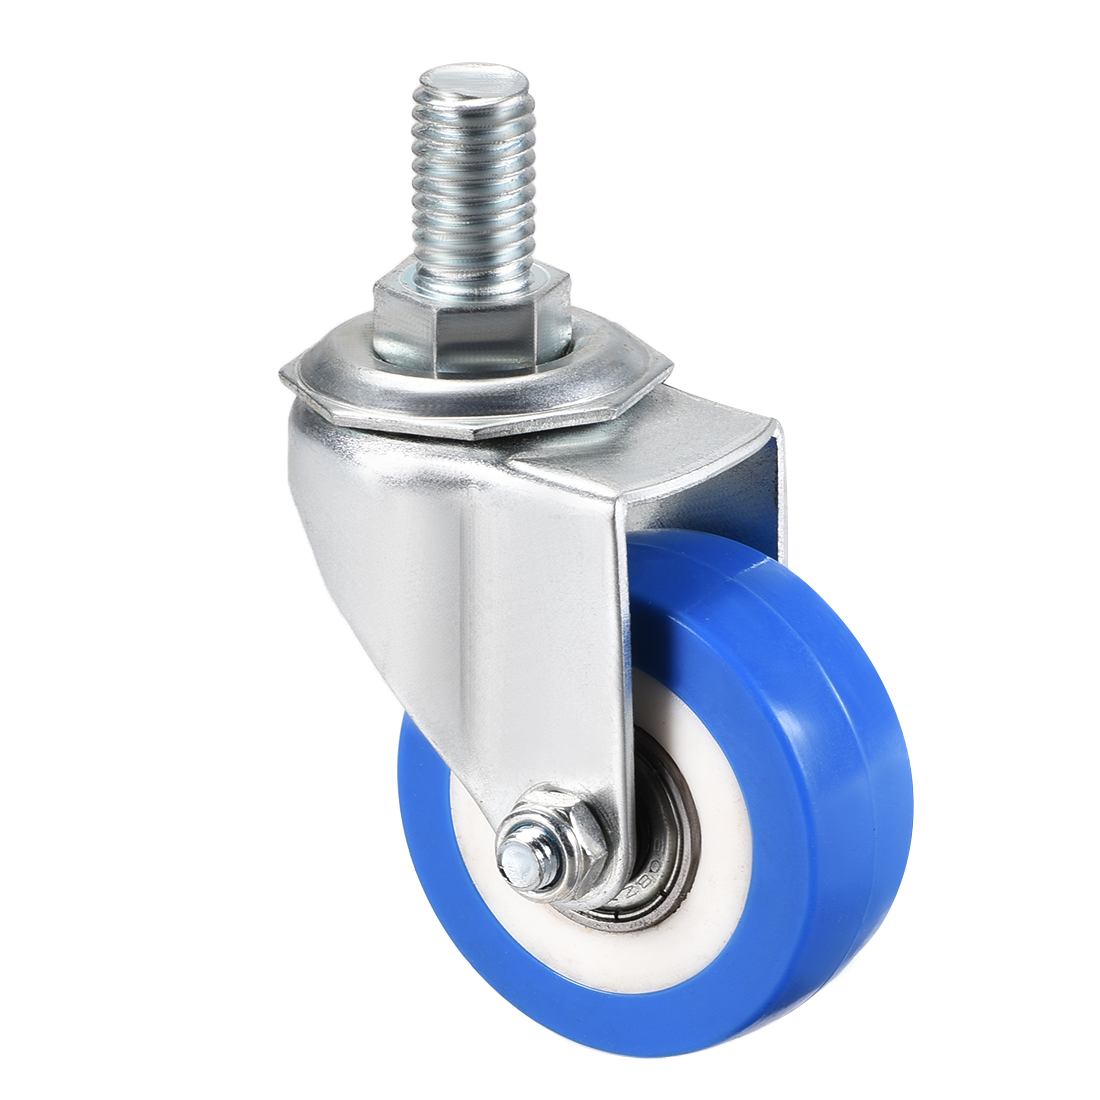 Swivel Caster Wheels PU Caster 2 Inch Dia Wheel M12 x 20mm Thread 132lb Capacity